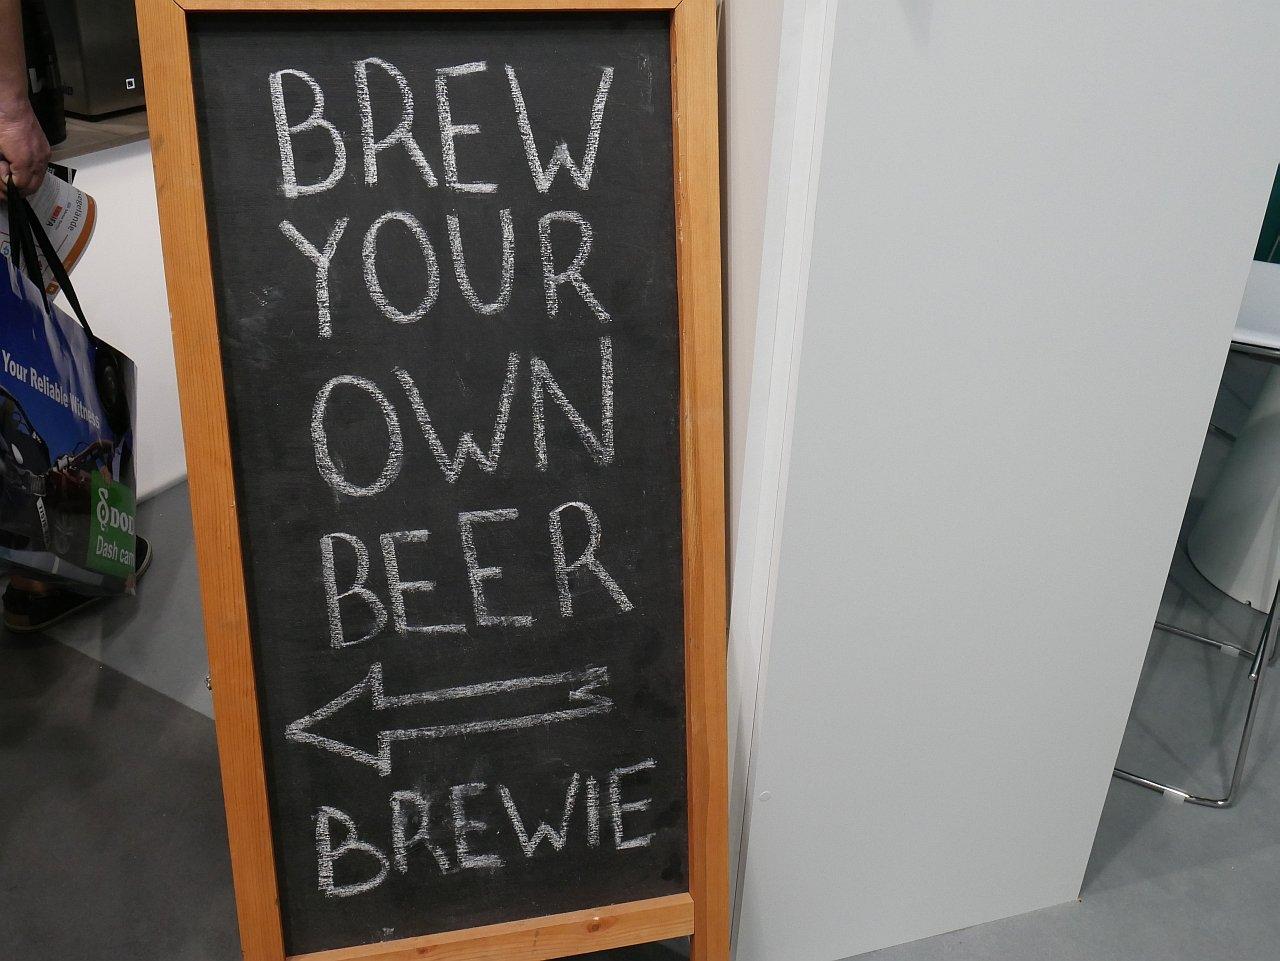 Brewie